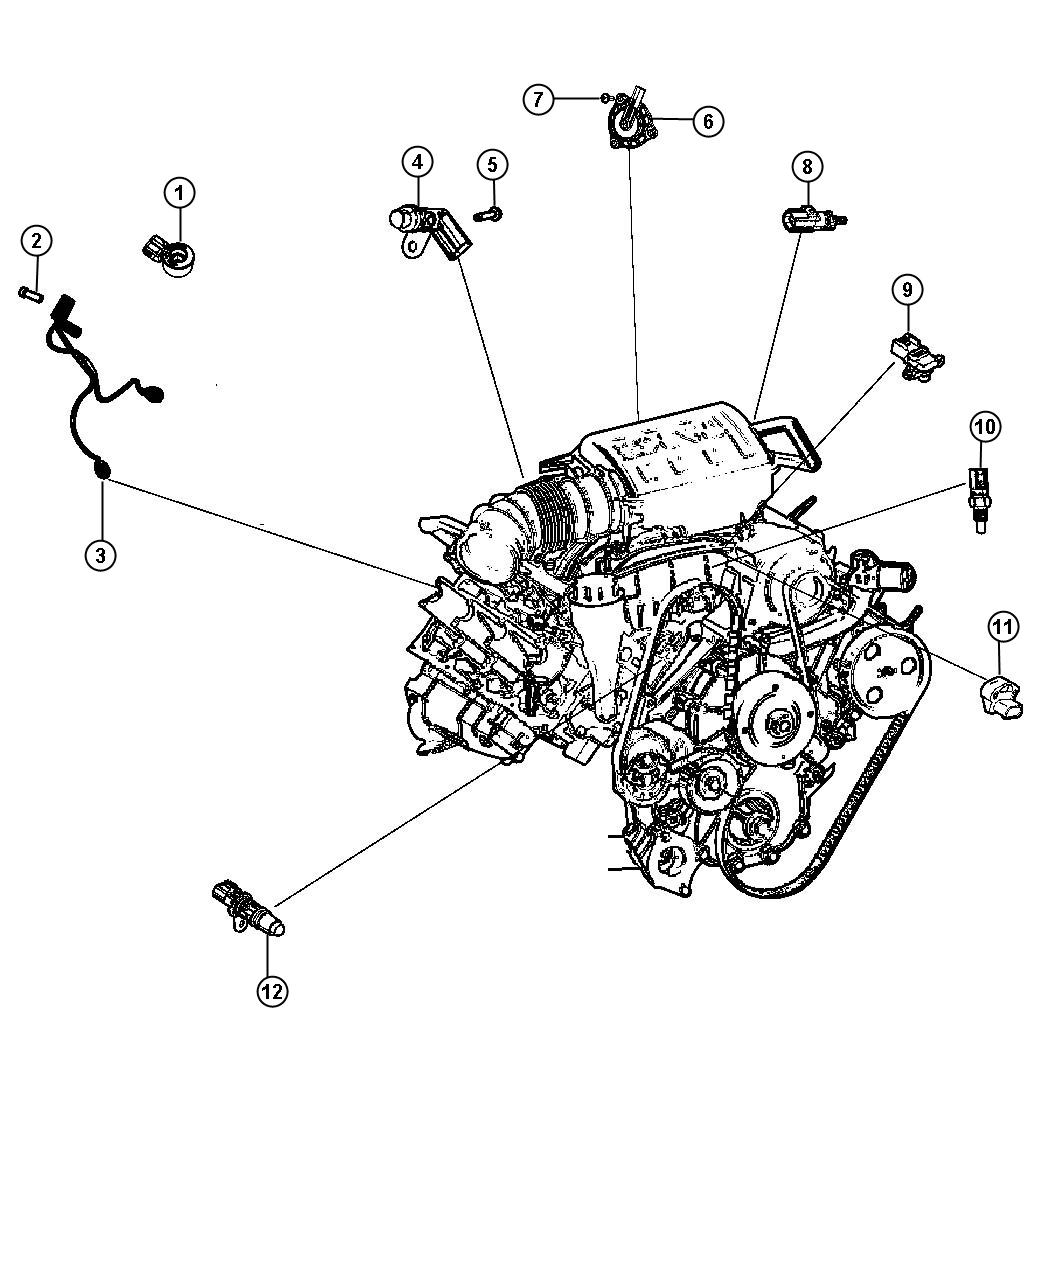 wrangler wiring diagrams for 2013 rz 4278  2013 jeep wrangler engine wiring diagram download diagram  engine wiring diagram